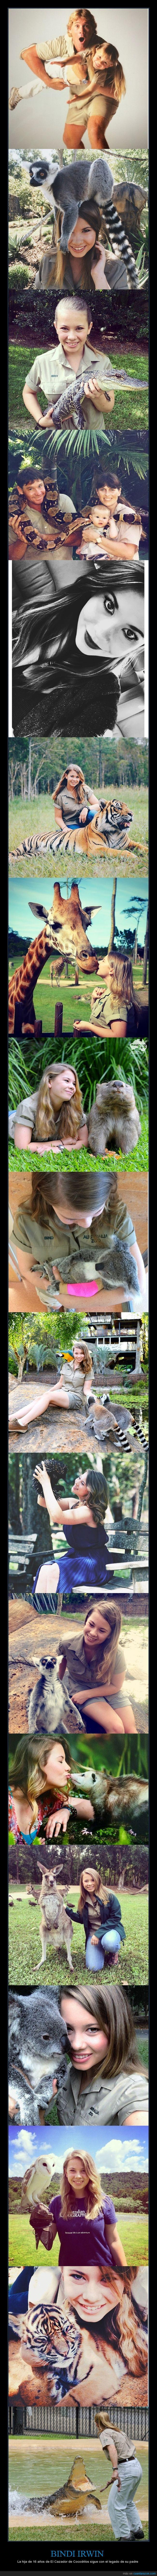 animal,Bindi Irwin,cocodrilo,echidna,El cazador de cocodrilos,jirafa,koala,mono,Steve Irwin,tigre,zoo